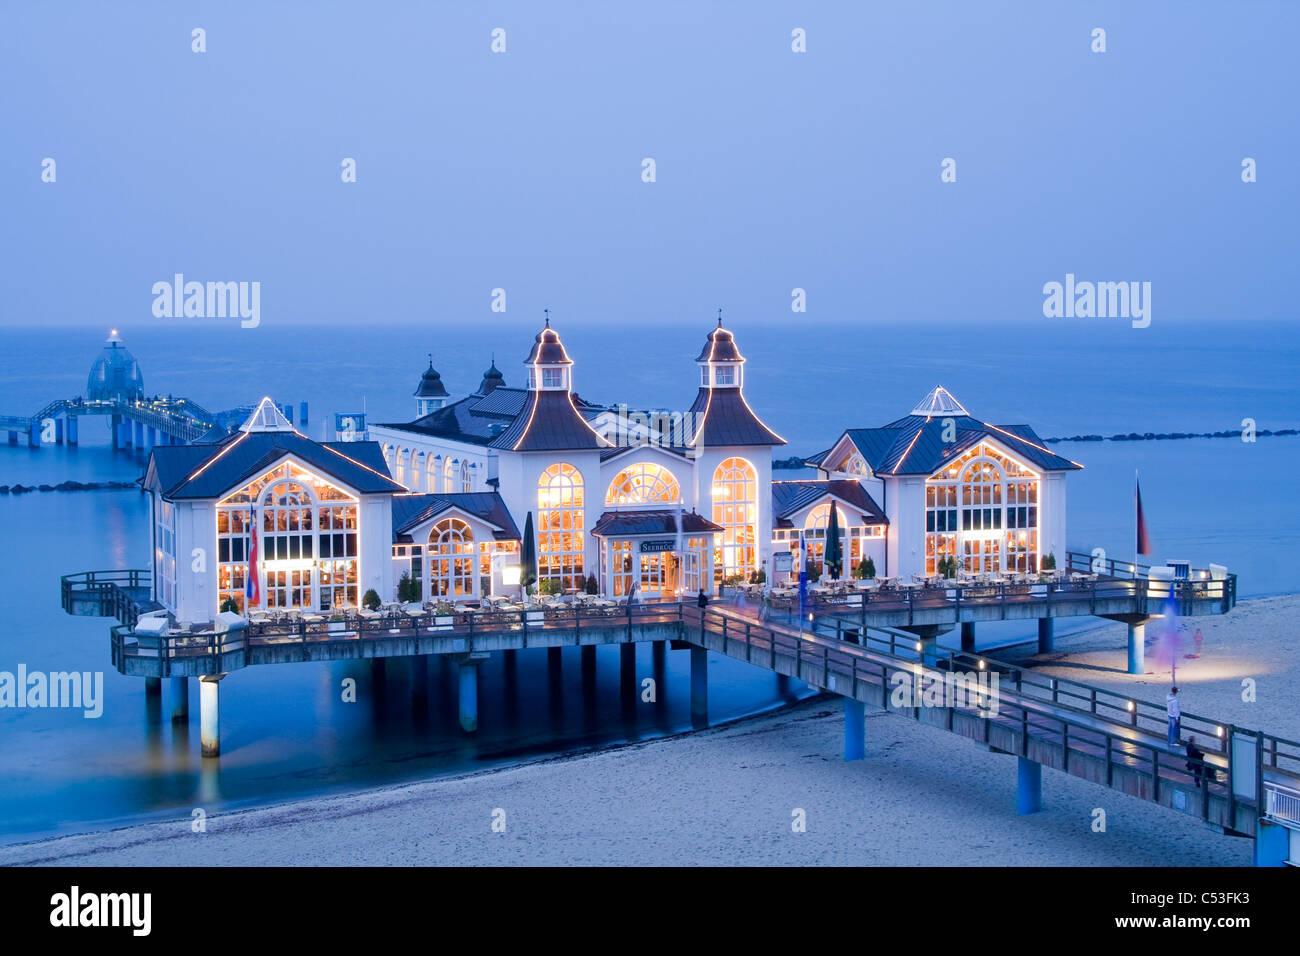 Pier in Sellin, seaside resort on Ruegen Island, evening mood, Baltic Sea, Mecklenburg-Western Pomerania, Germany, Stock Photo